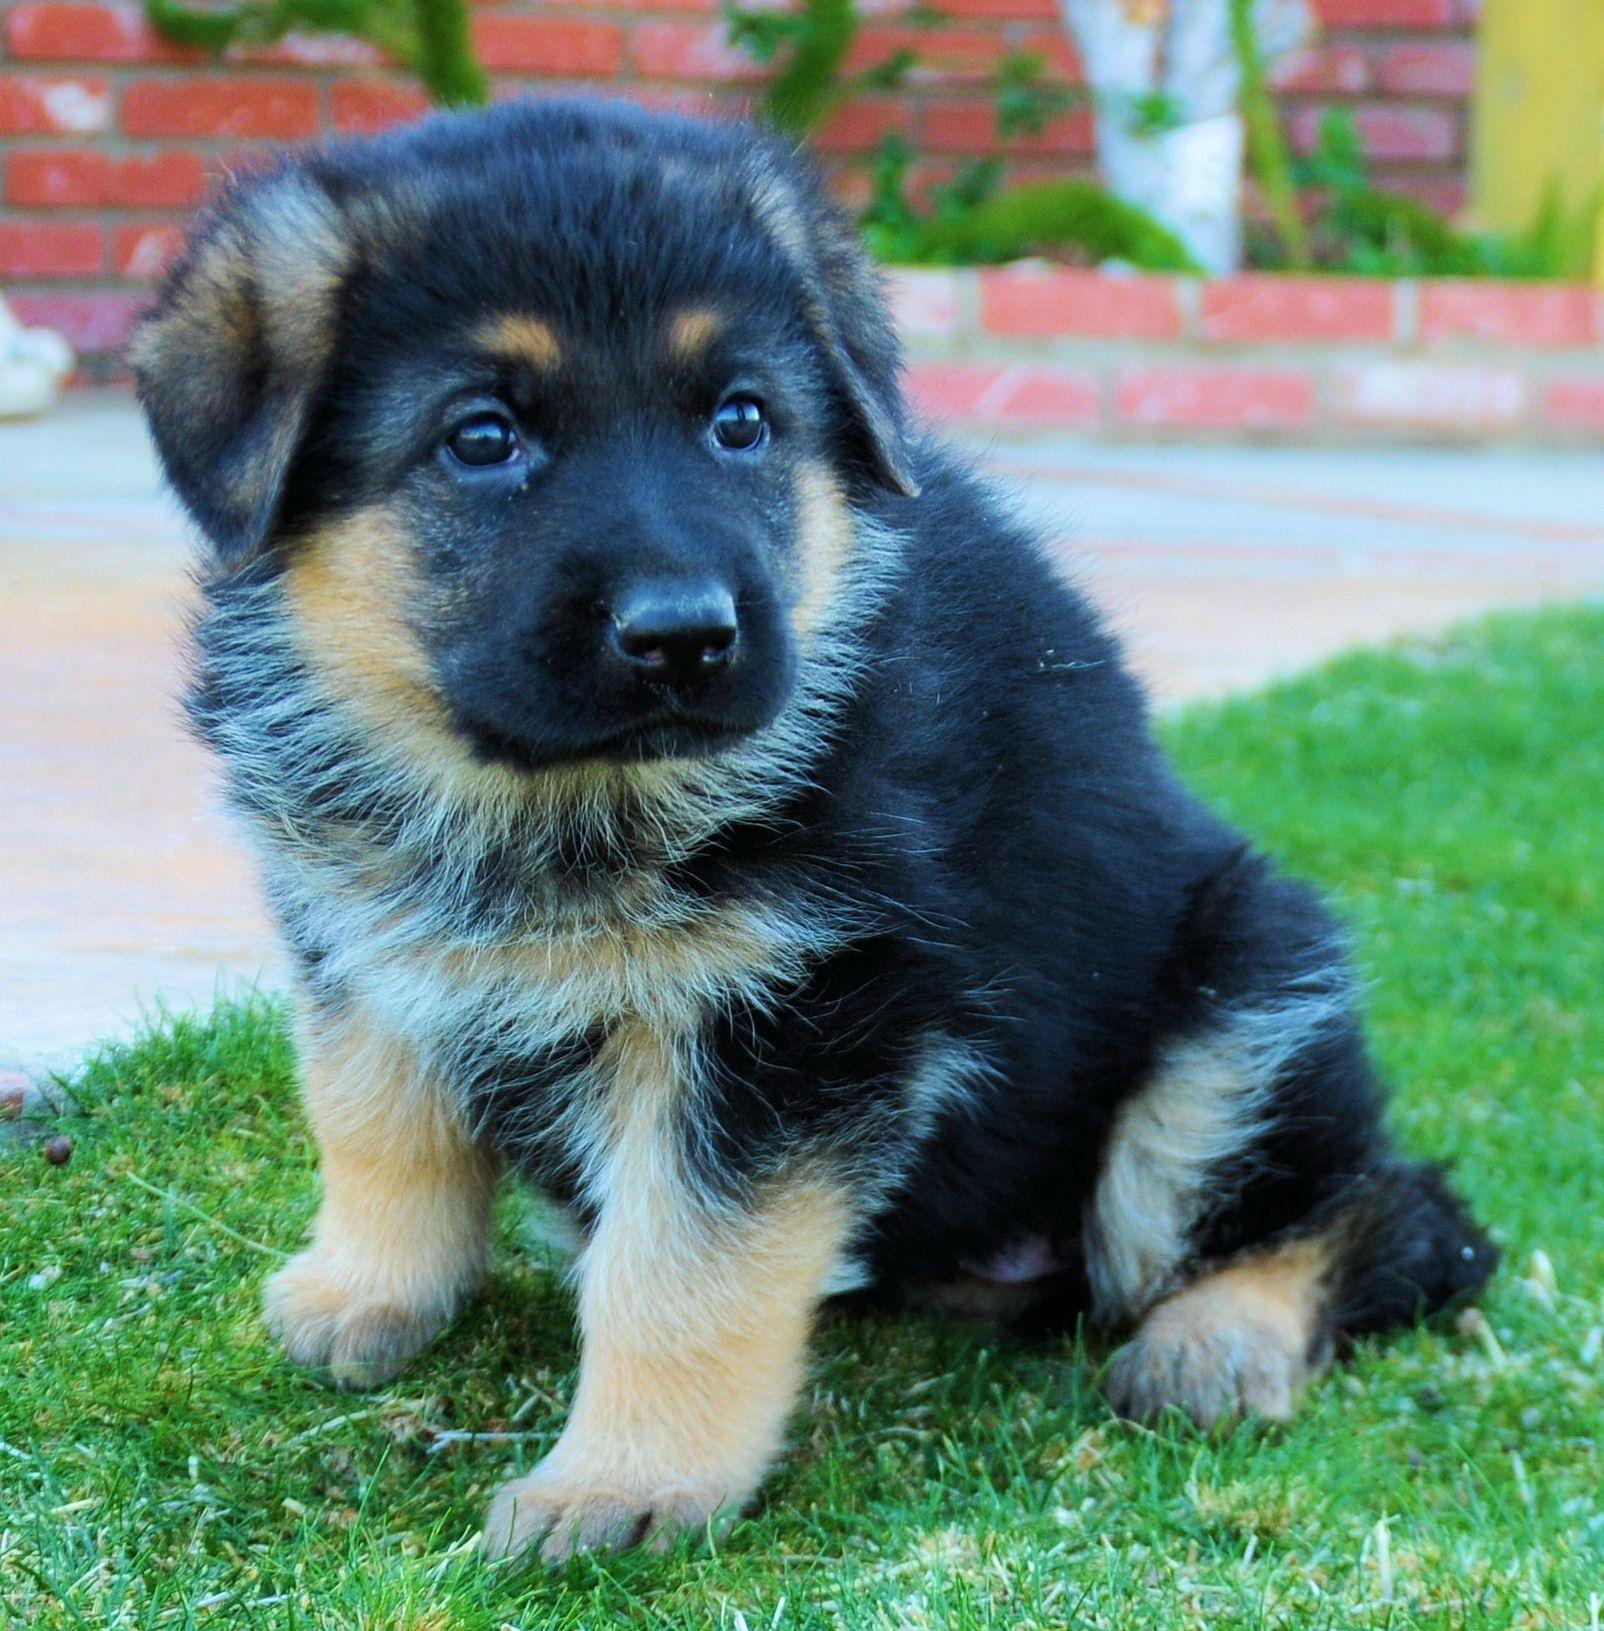 This is Sheamus when he was little. German Shepherd